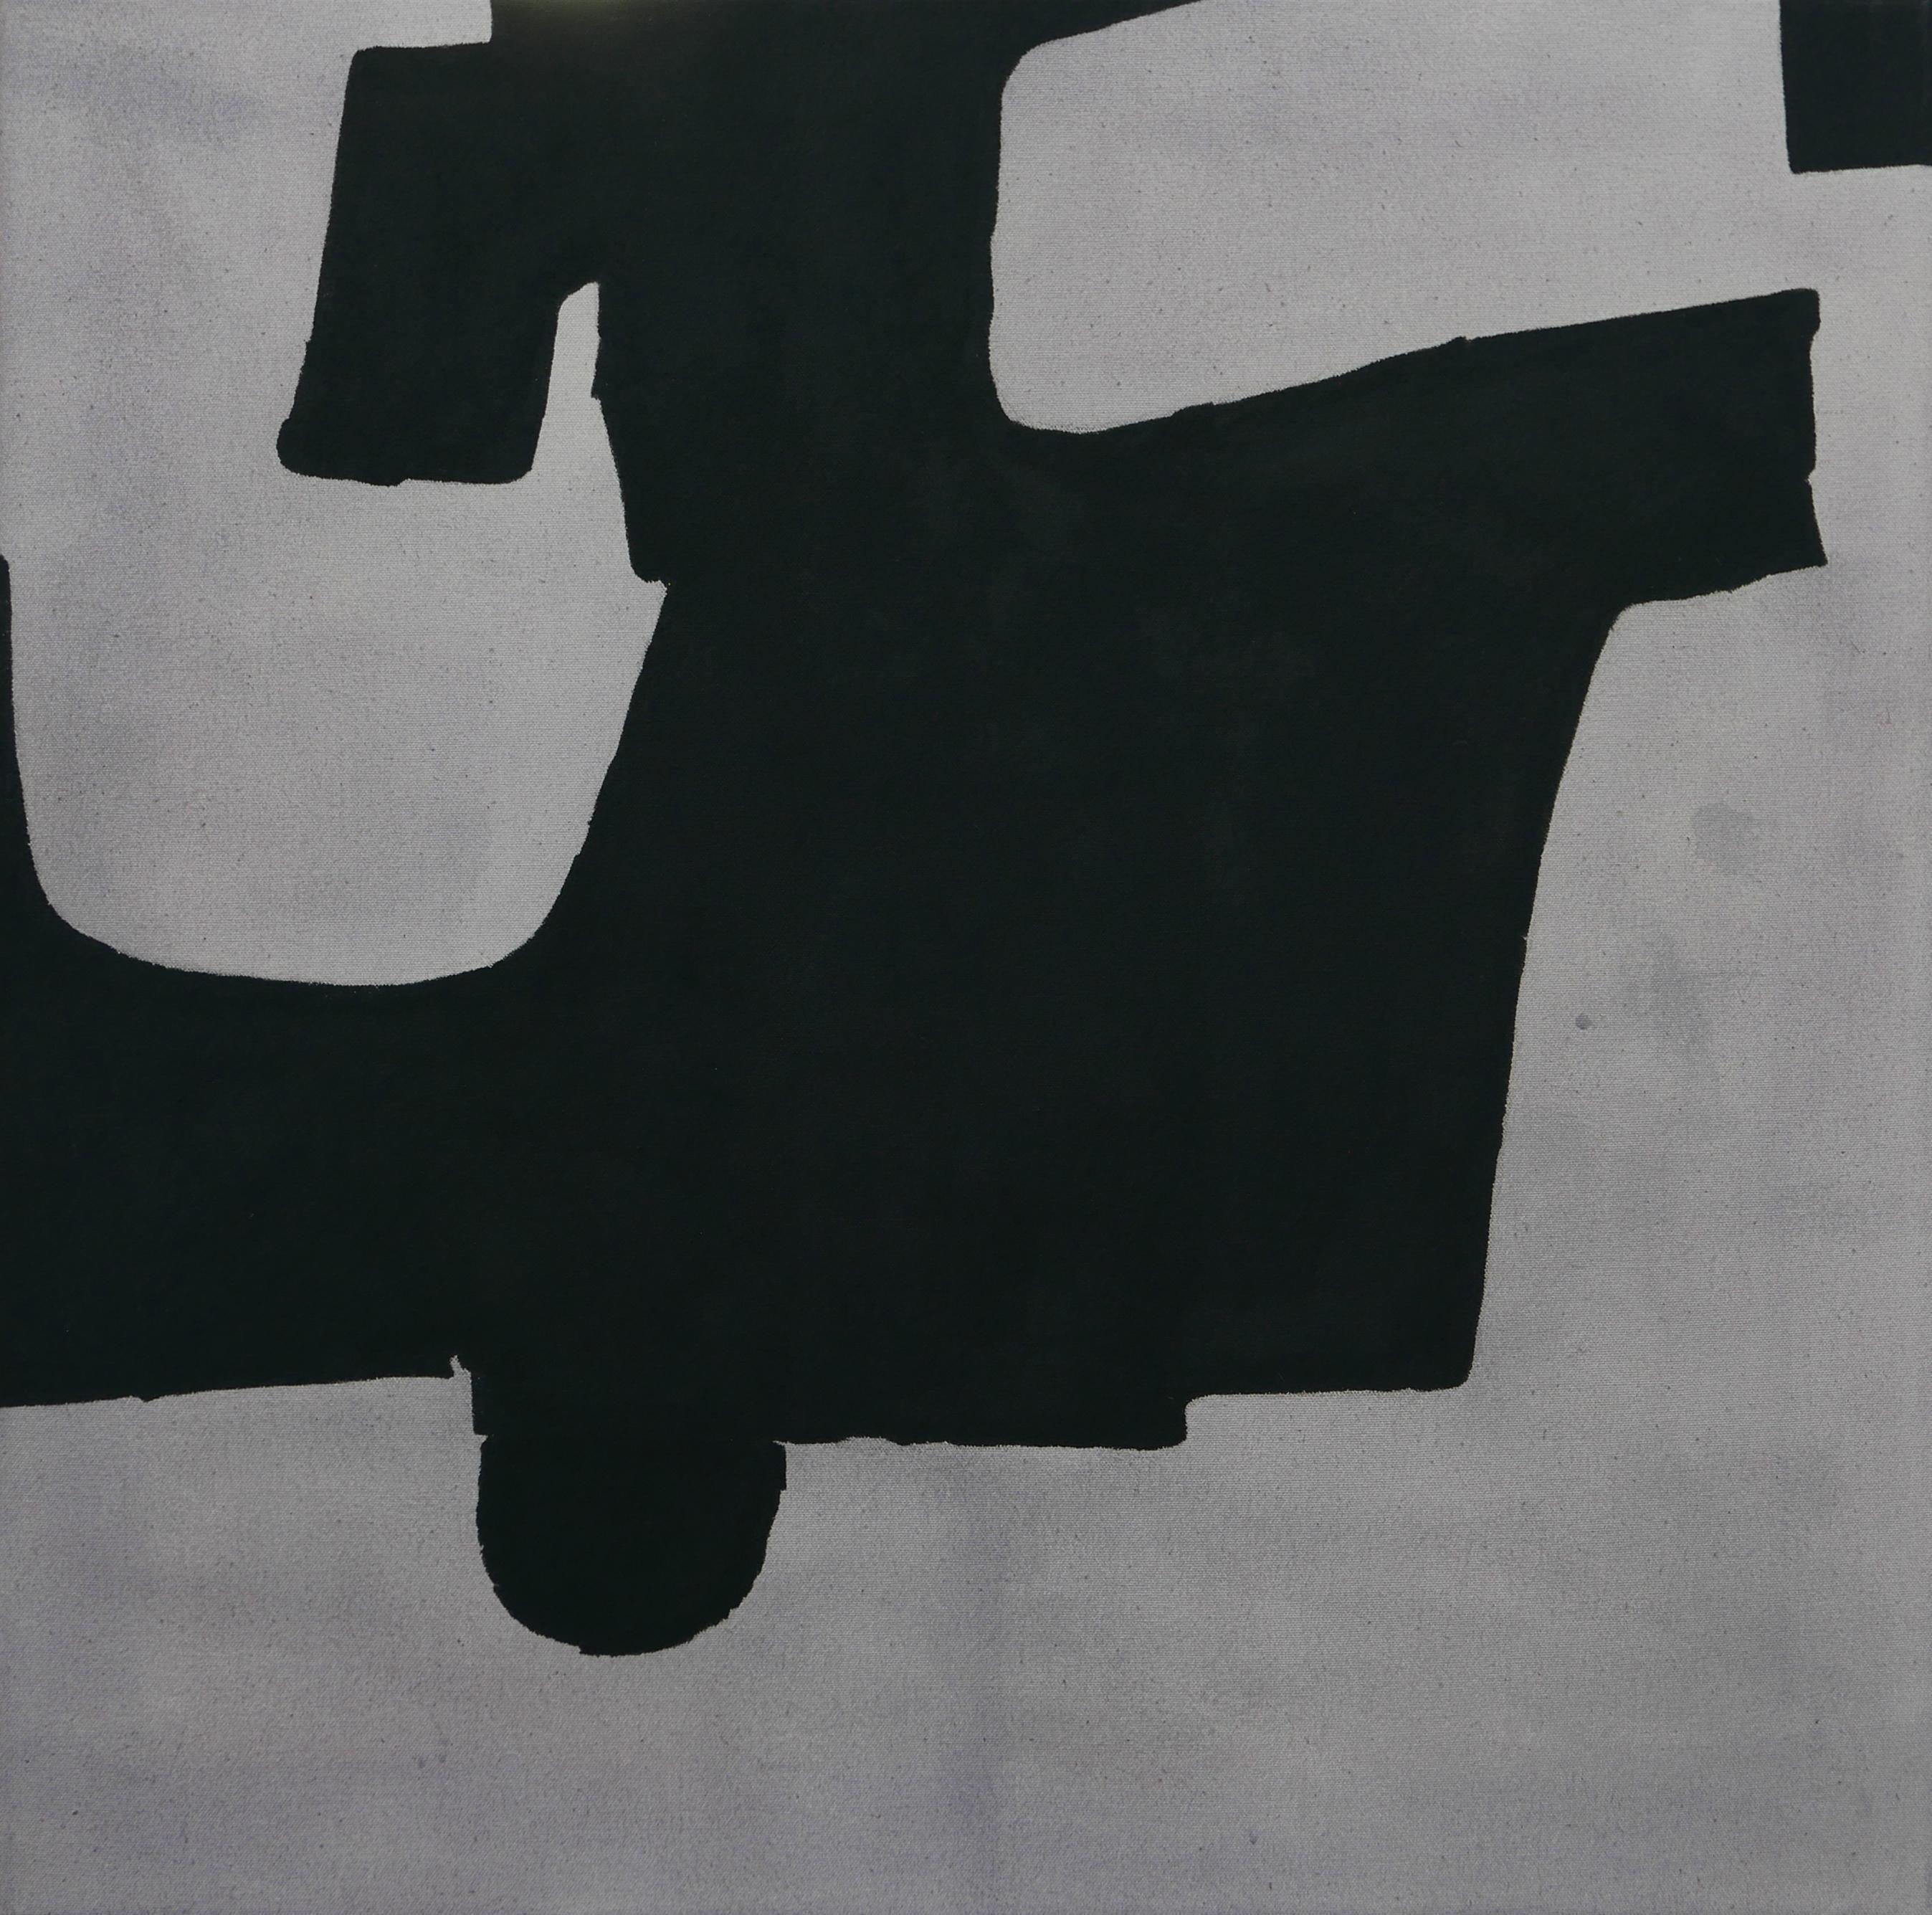 Untitled (Venice #2) 510 X 510mm